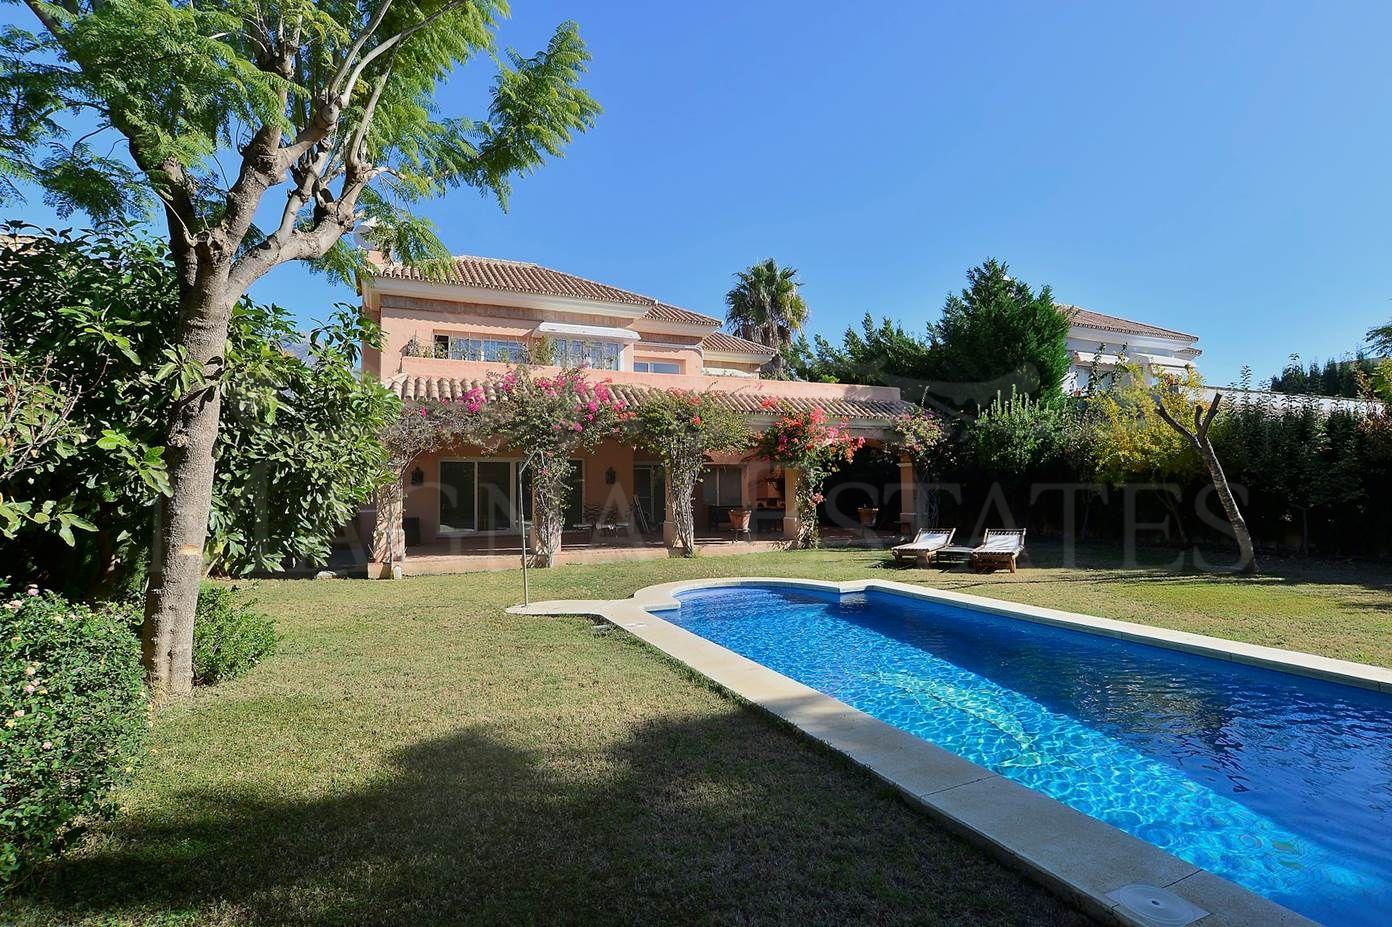 Andalucian style villa with private elevator in Nueva Andalucía, Marbella